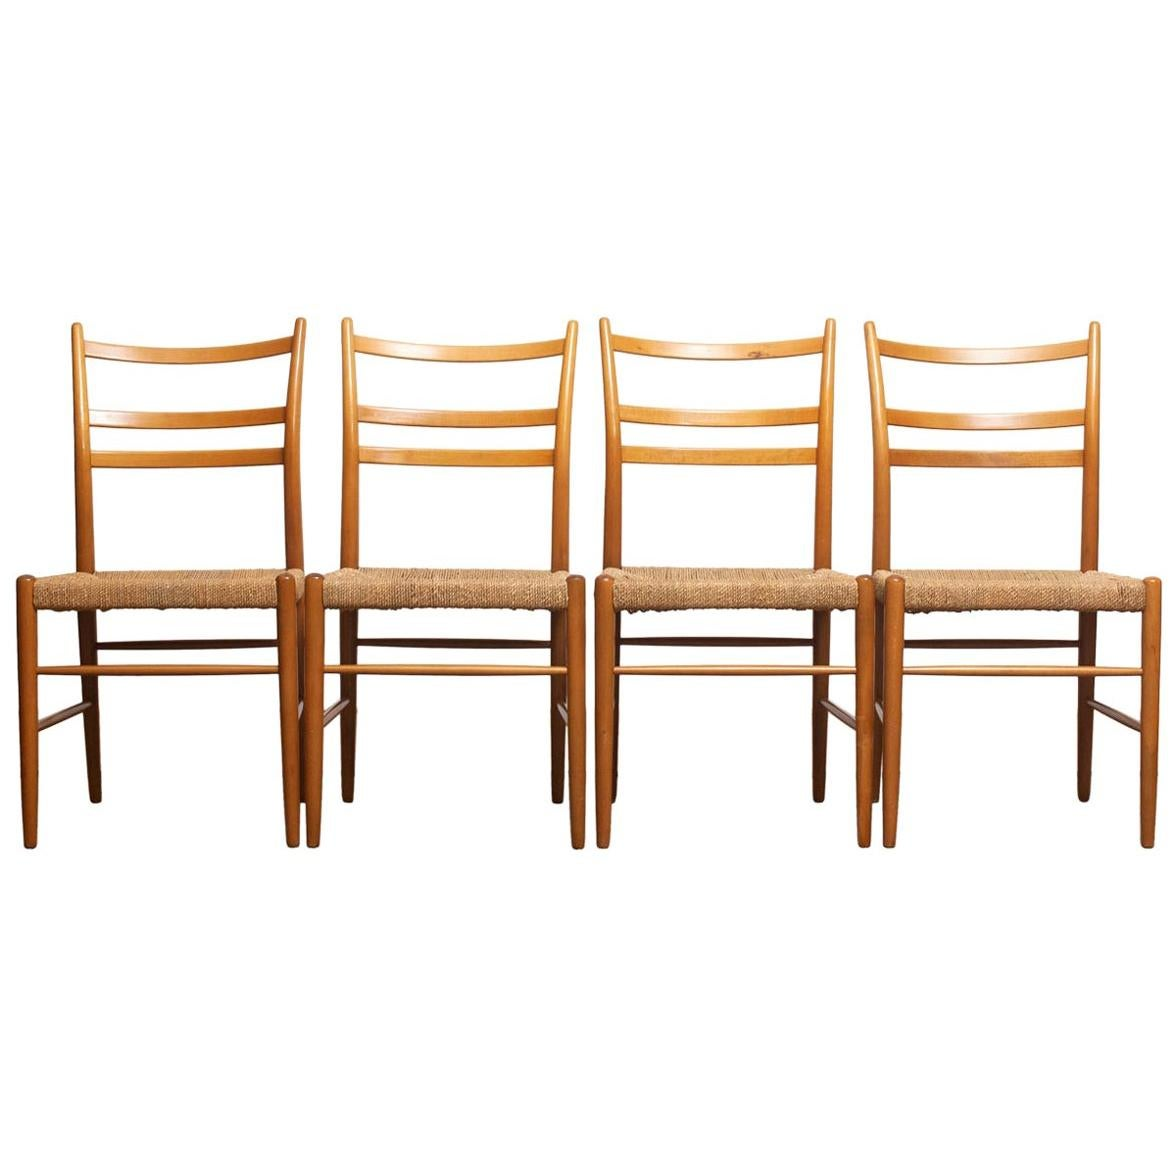 1960 Slim Beech Seagrass Dining Chairs by Yngve Ekström 'Gracell' by Gemla